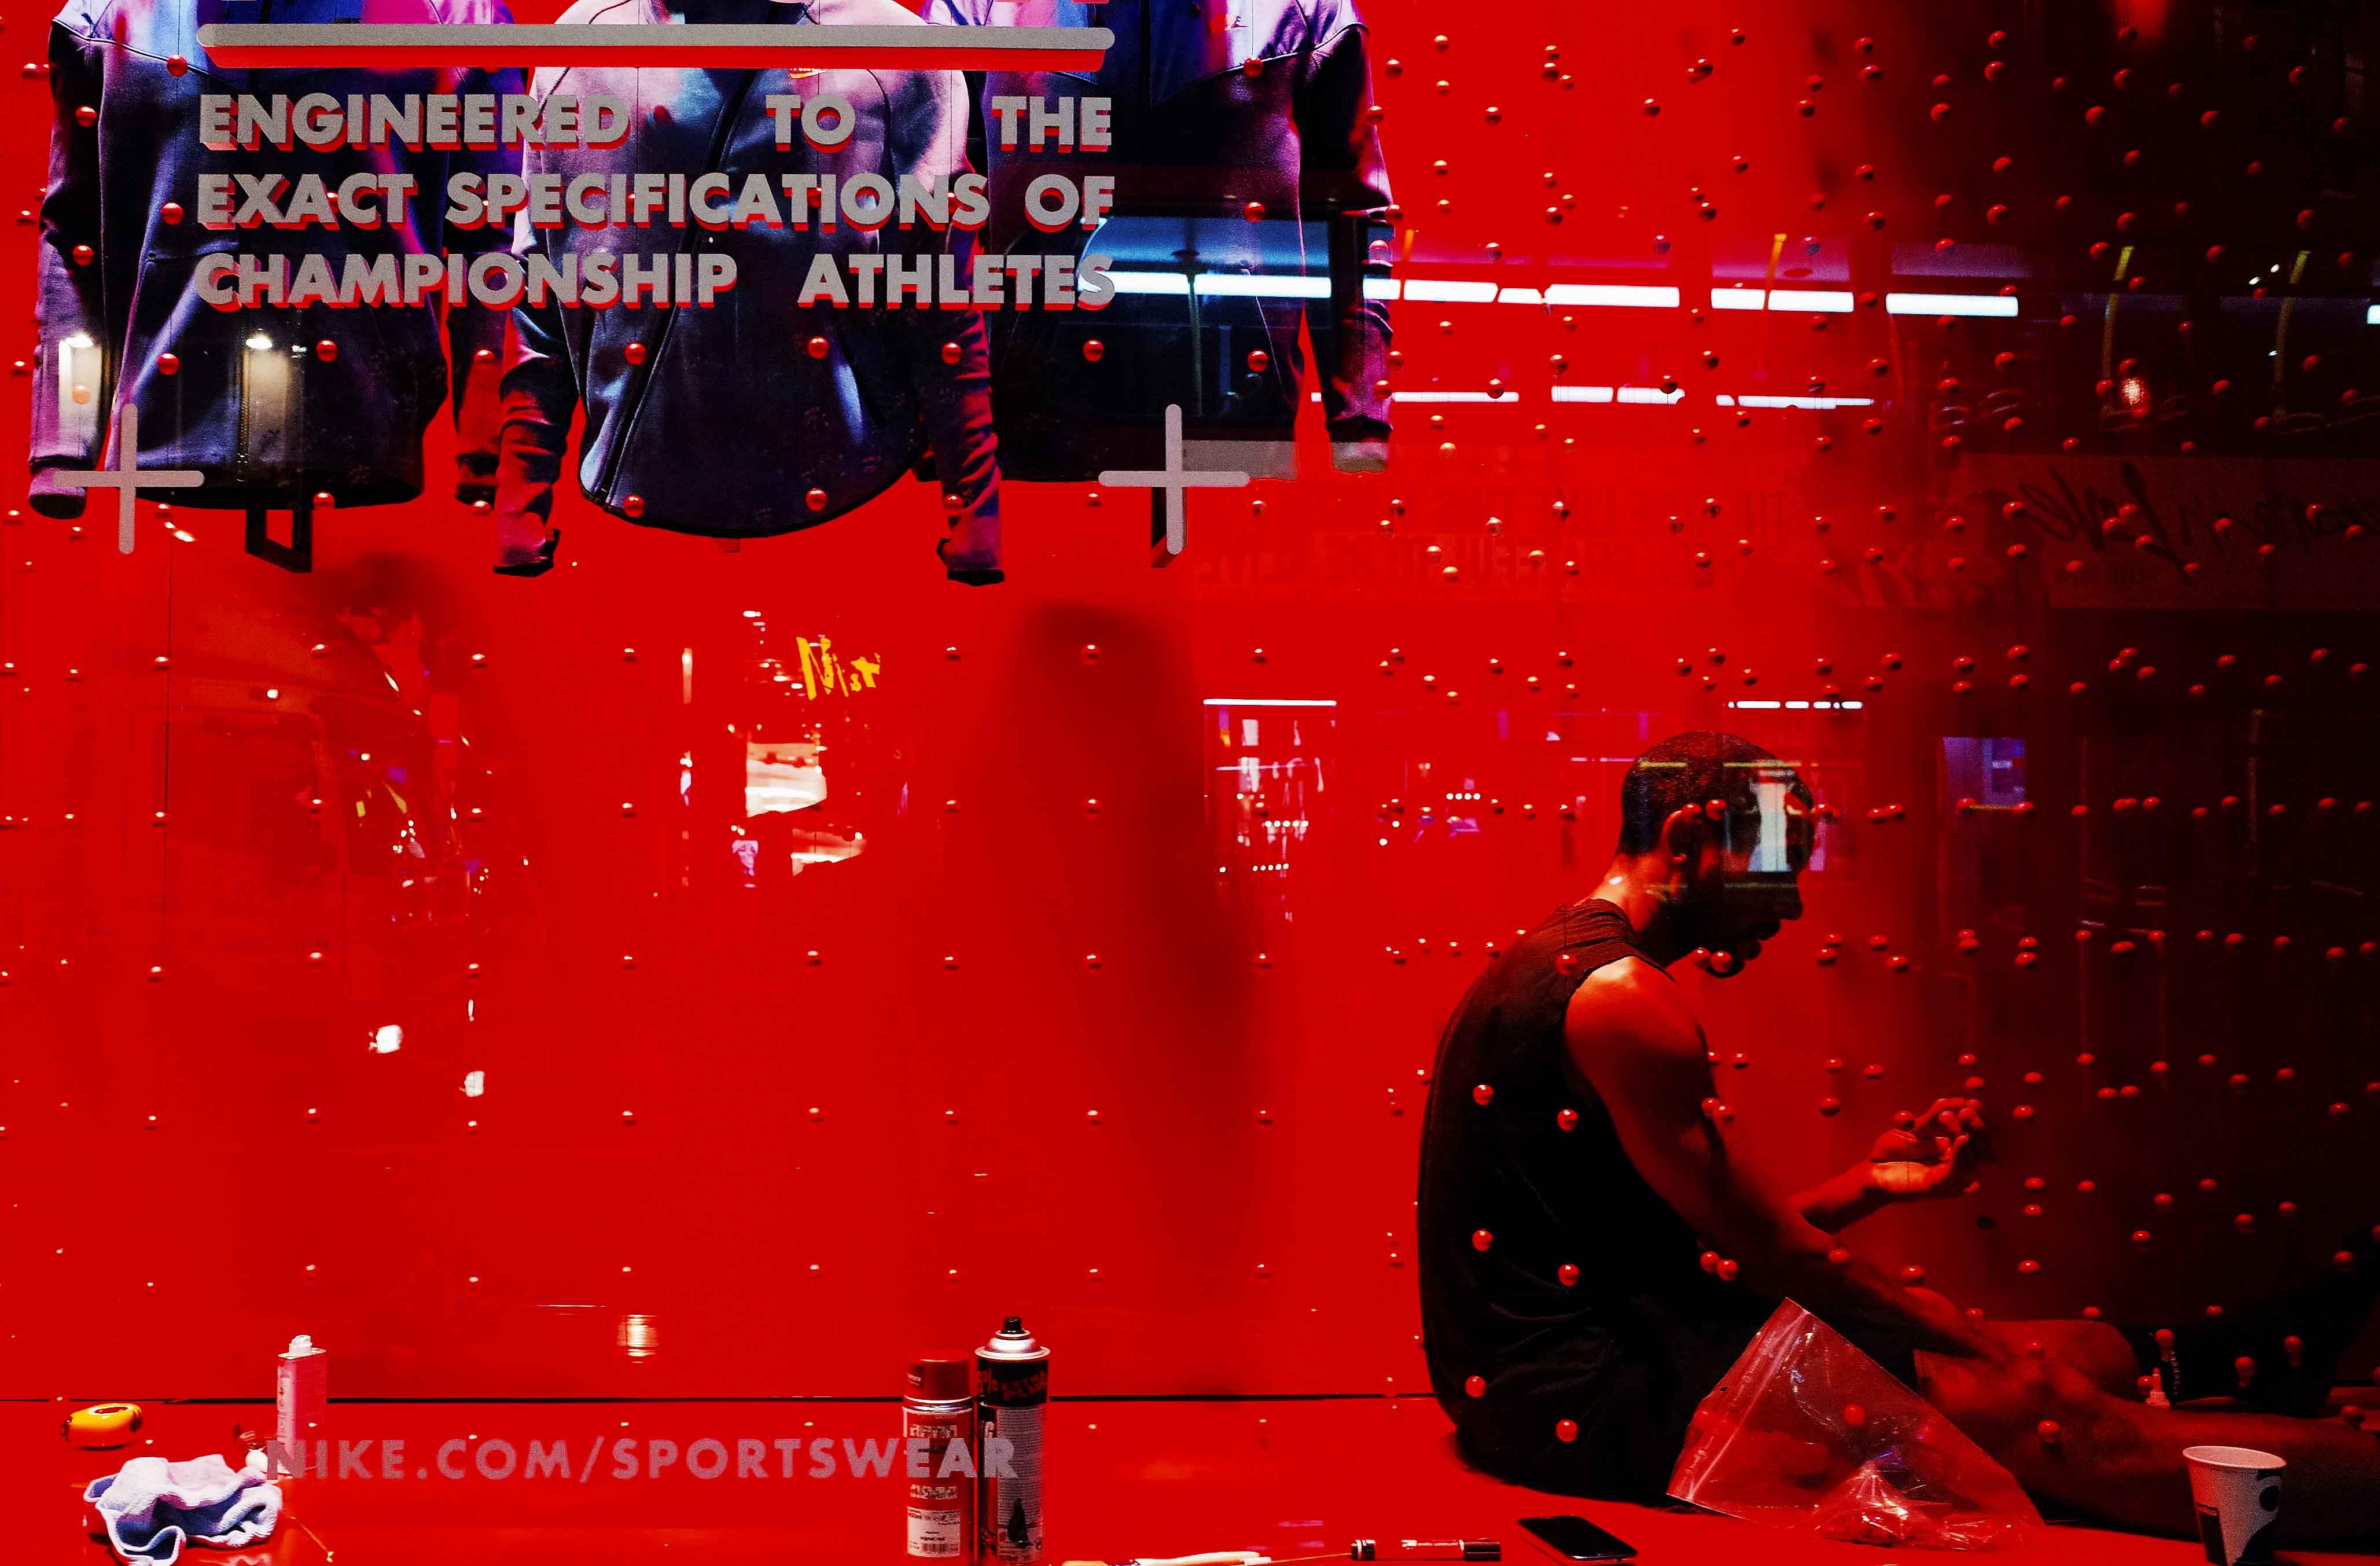 Red_Nike2w.jpg